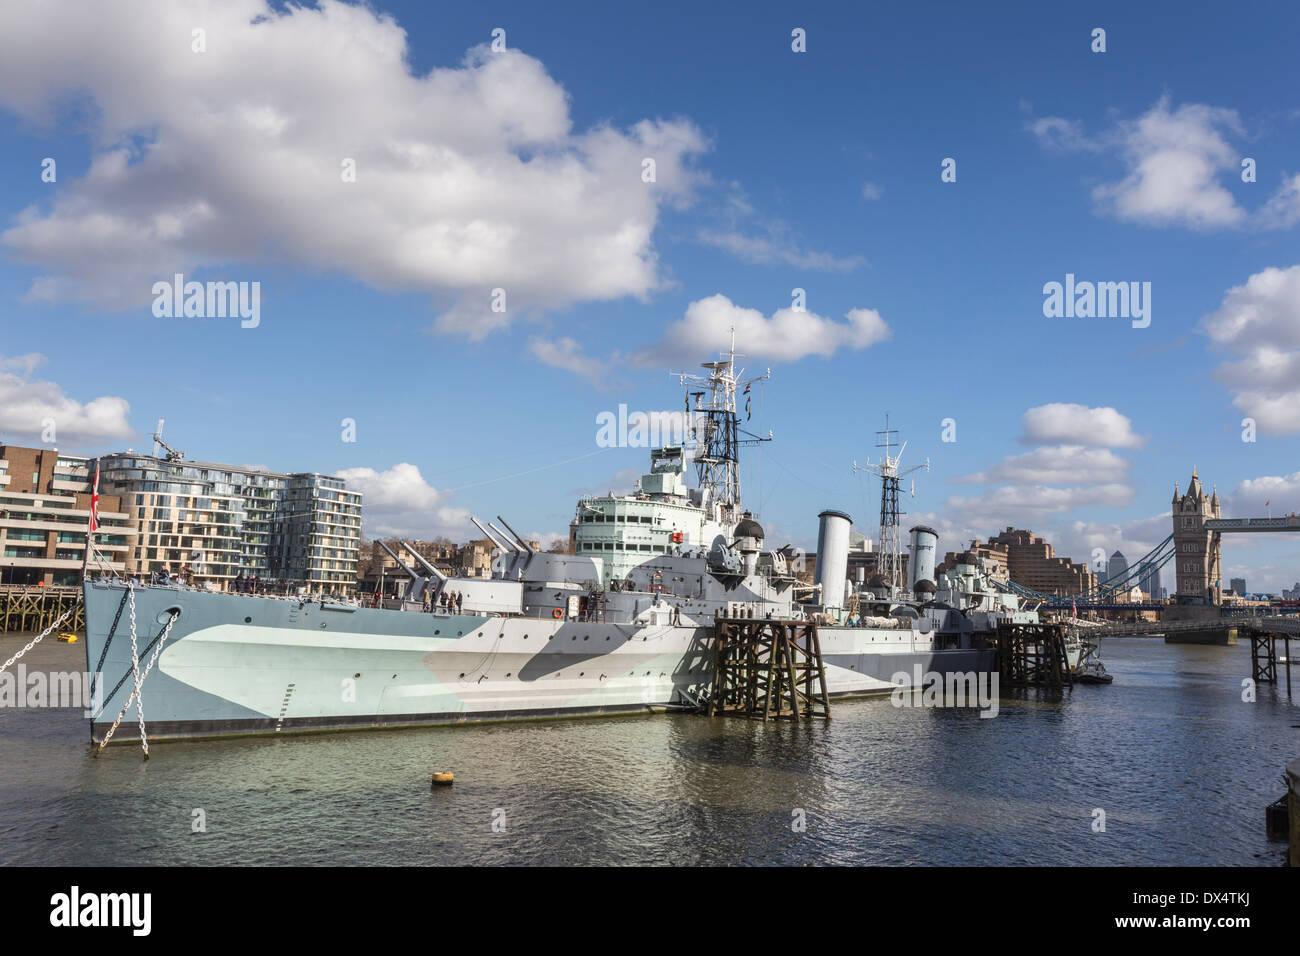 HMS Belfast London River Thames - Stock Image